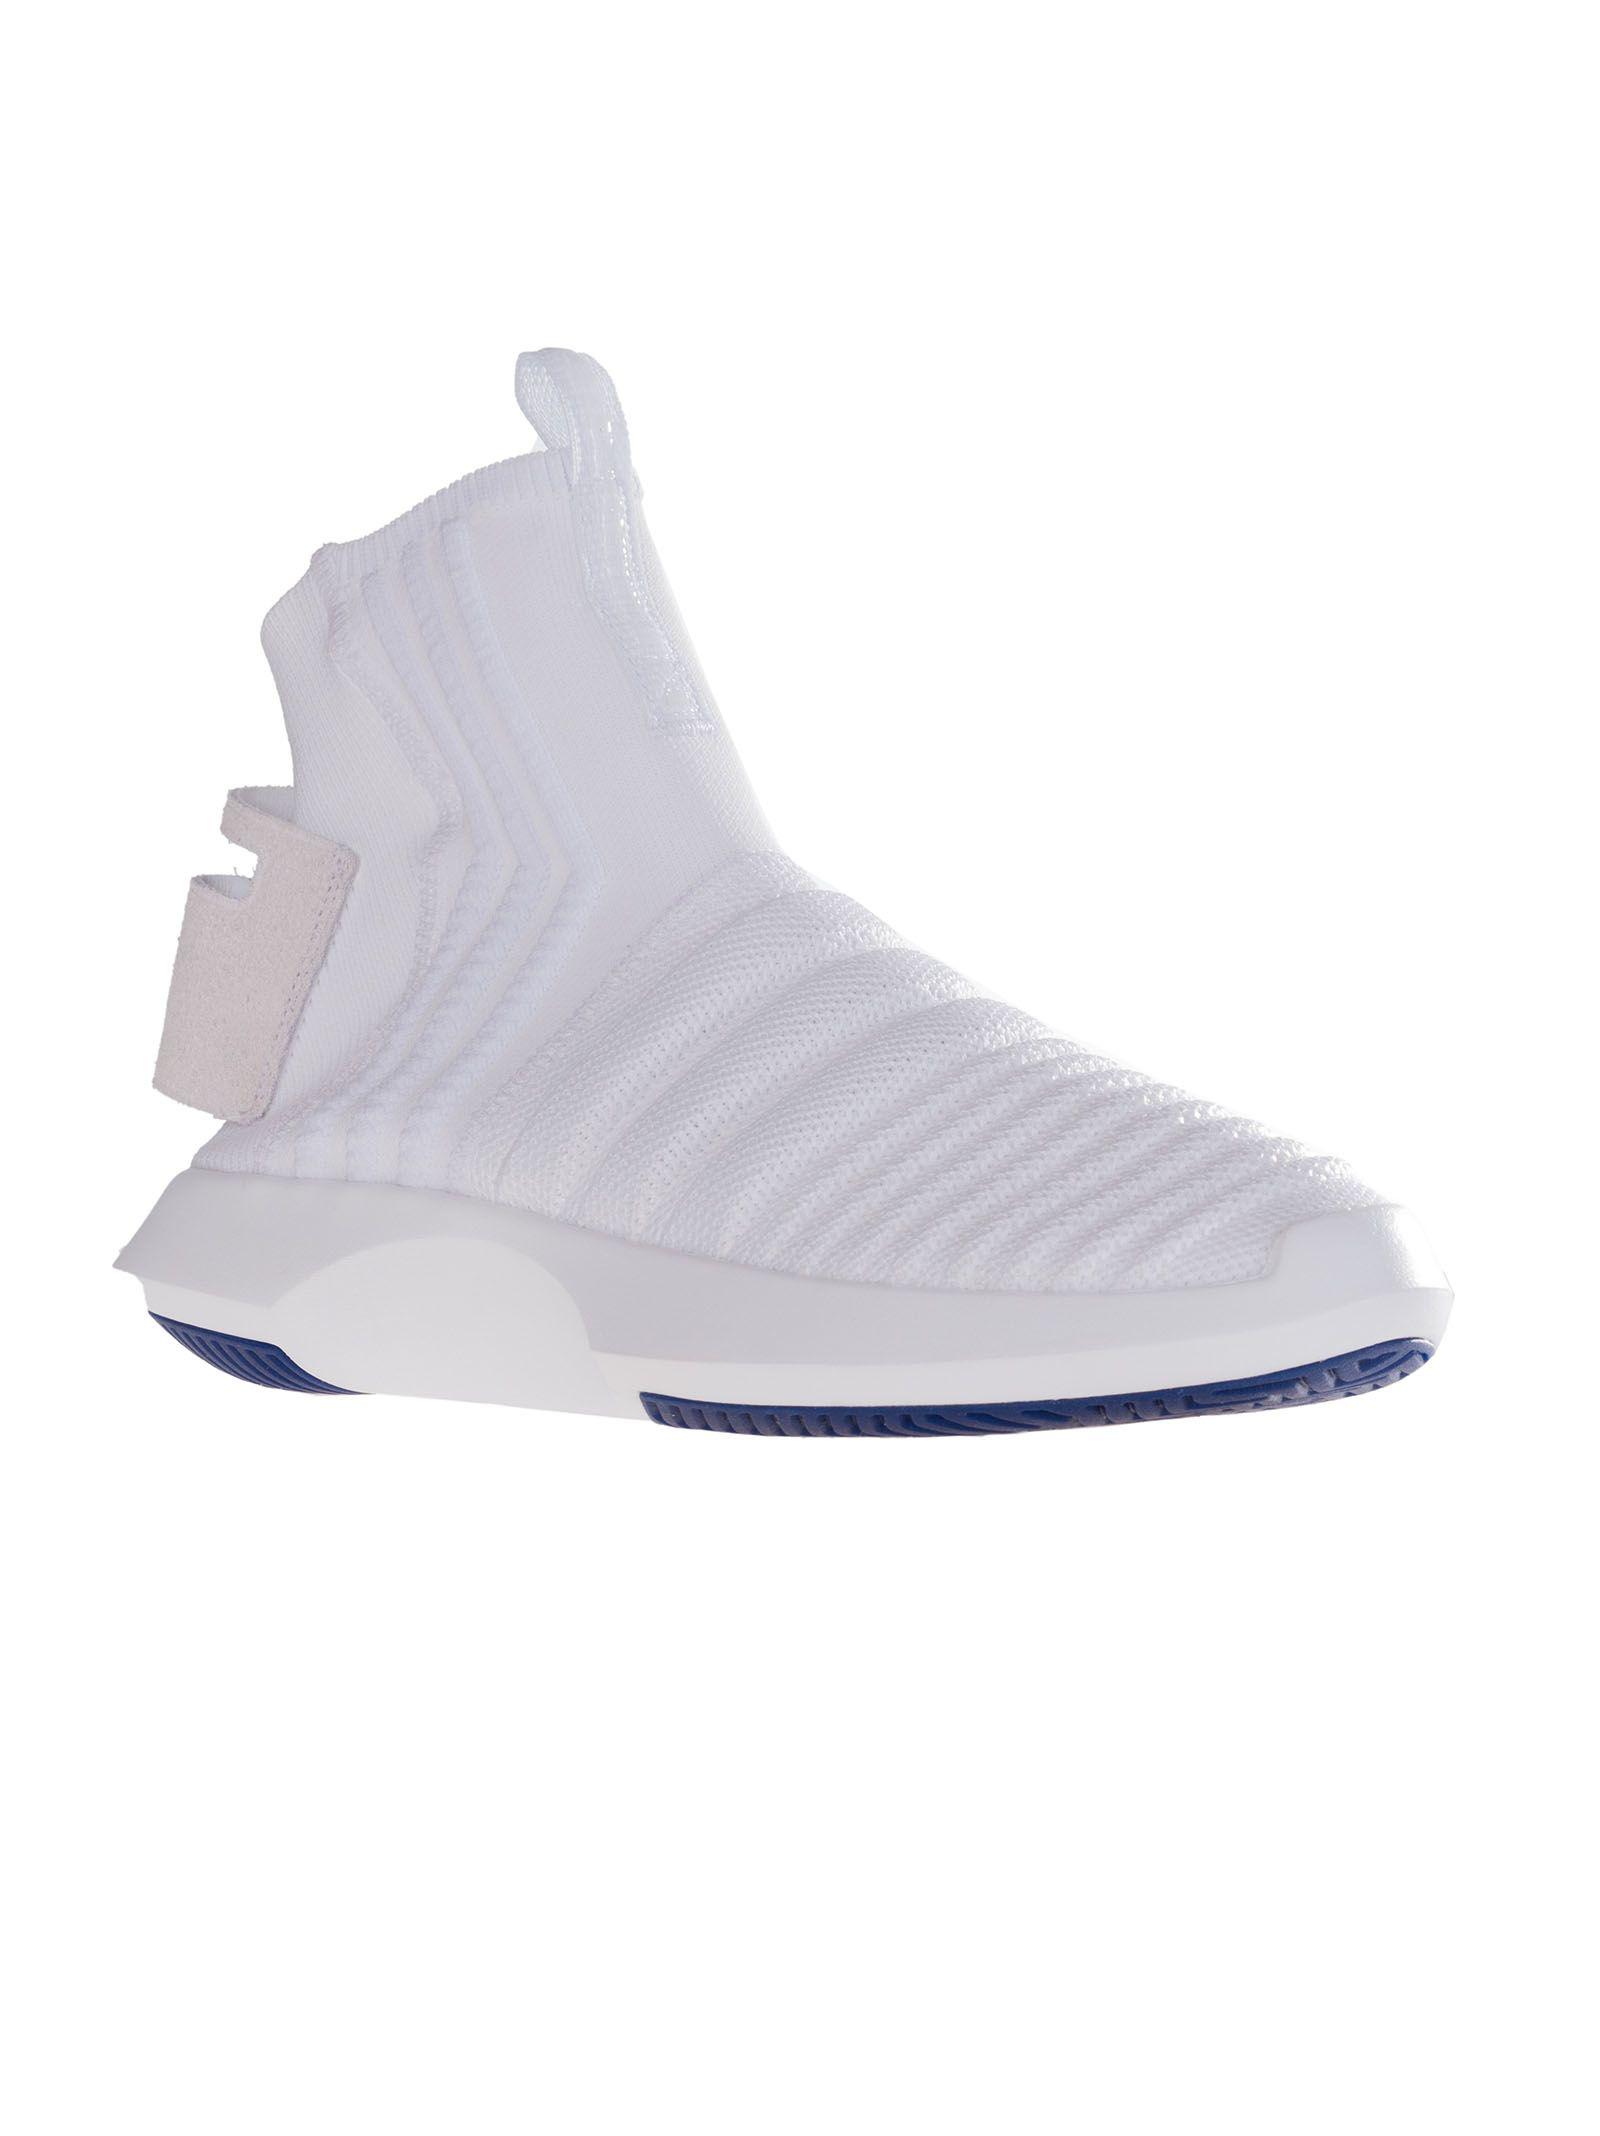 Adidas adidas pazzo 1 sock avanzata primeknit hi top.